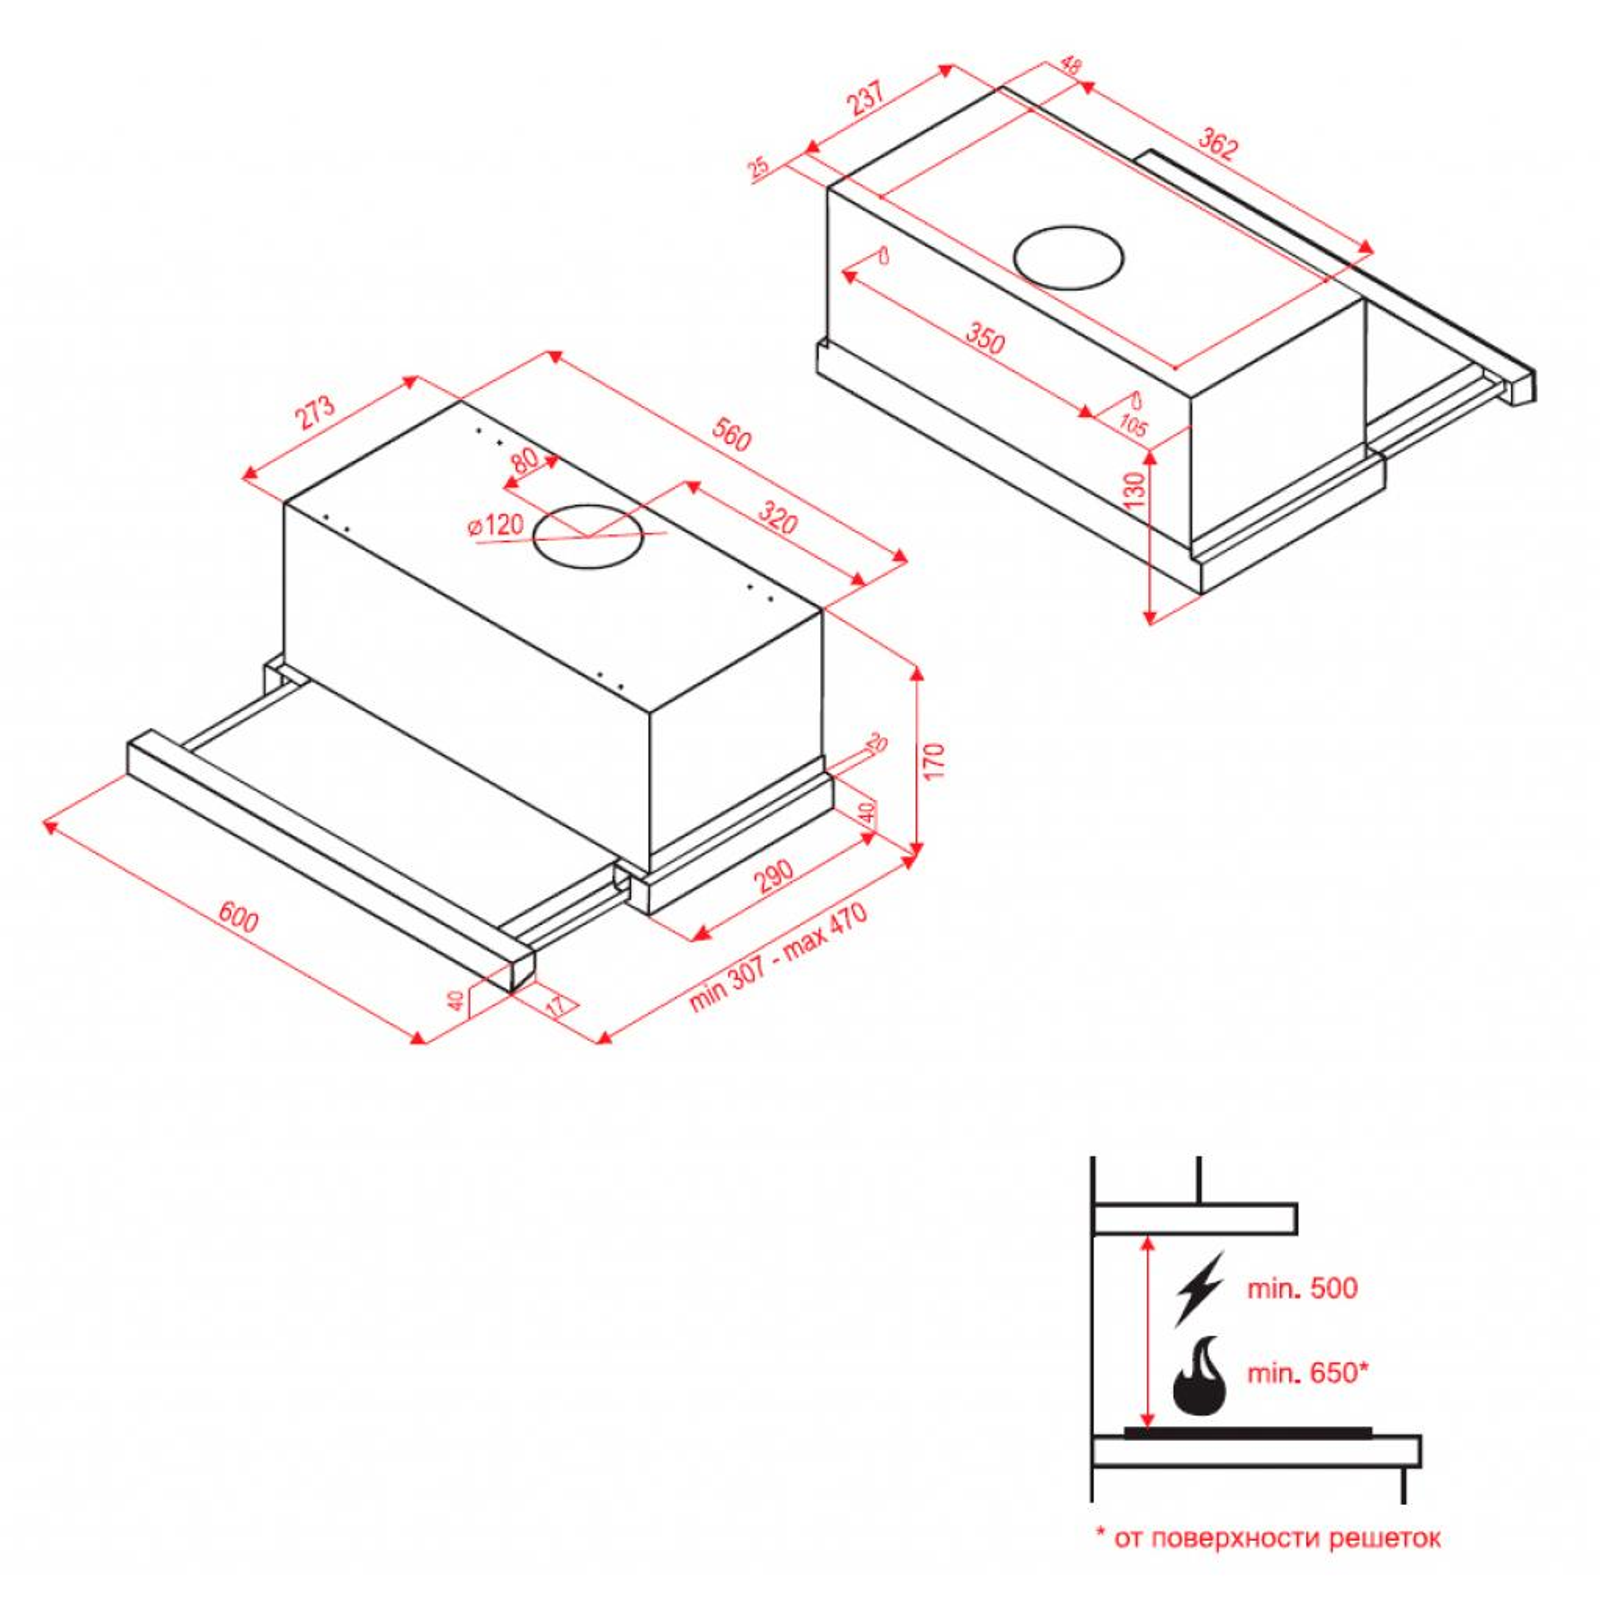 Вытяжка кухонная Perfelli TL 6112 IV LED изображение 7